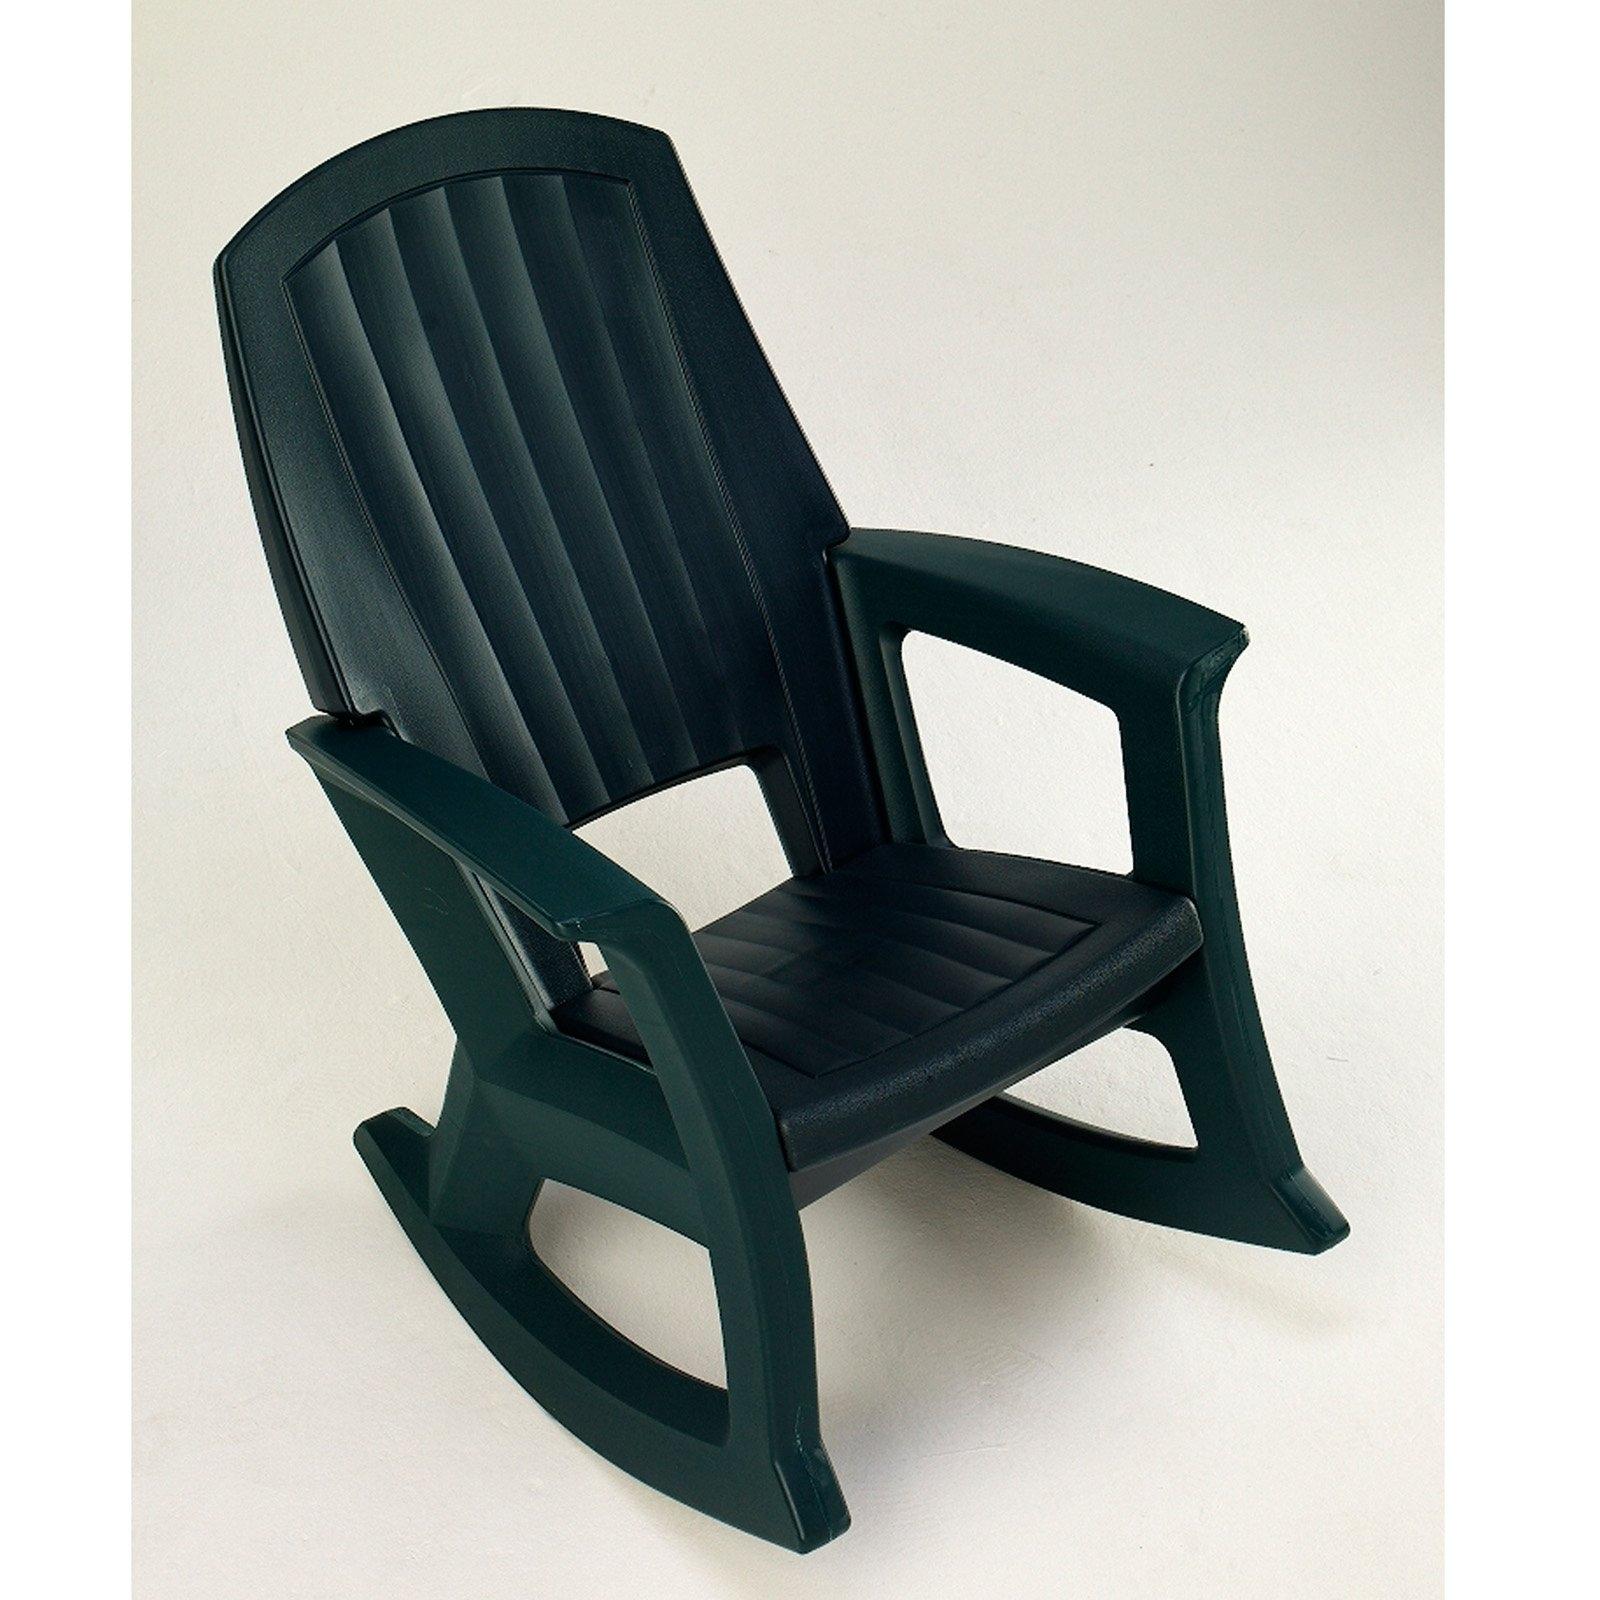 2019 Rocking Chairs At Walmart Regarding Semco Recycled Plastic Rocking Chair – Walmart (View 13 of 20)